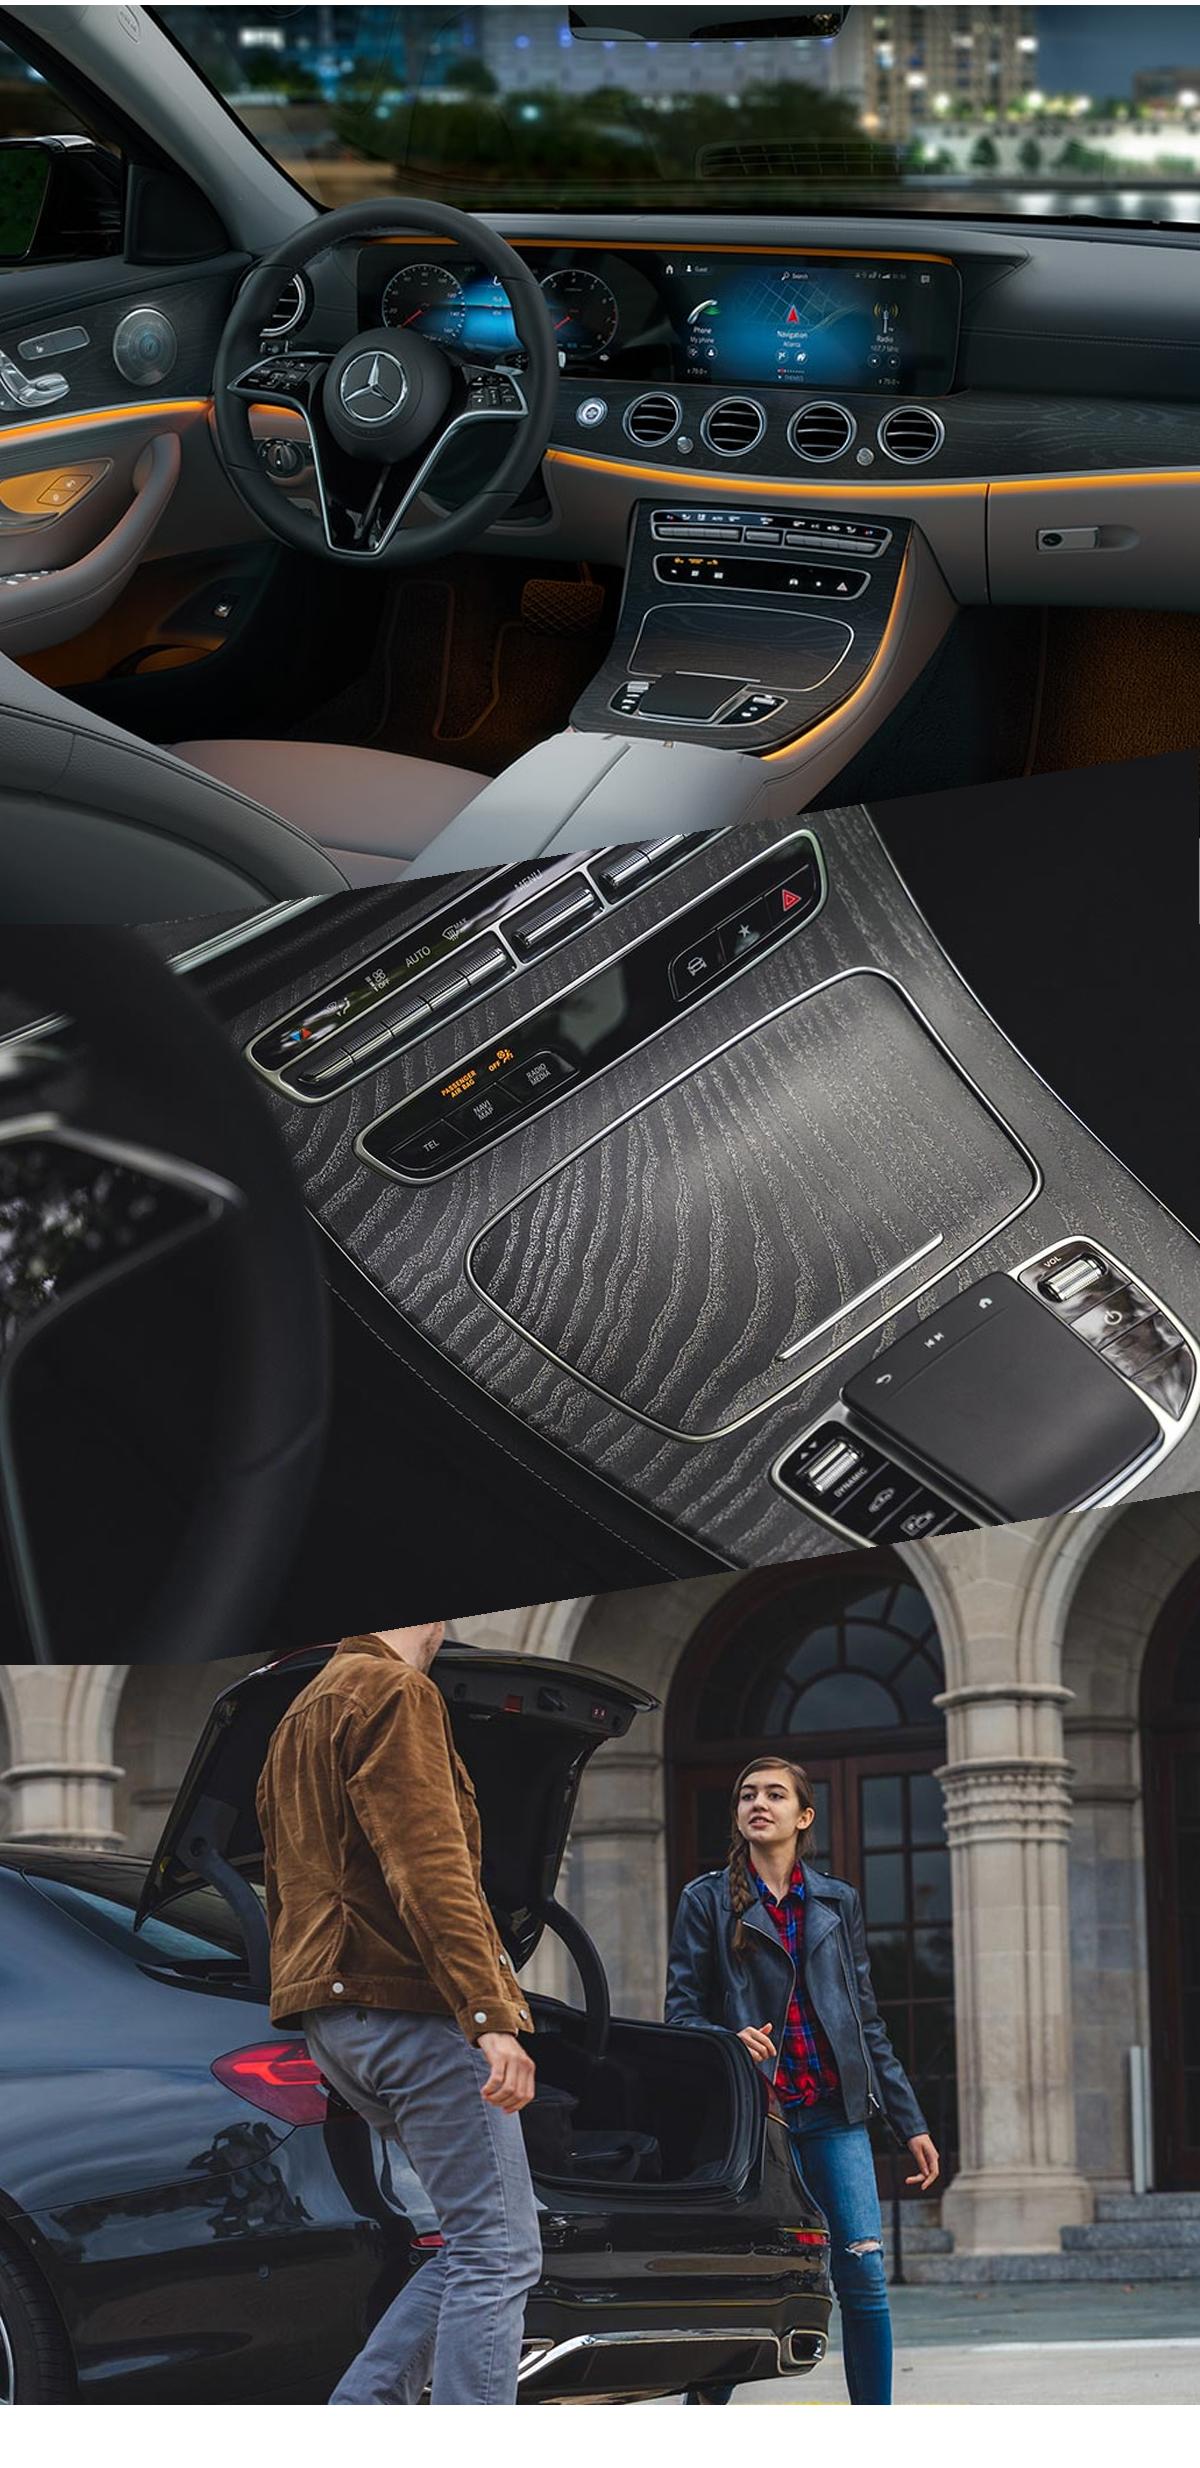 2021 Mercedes-Benz E-Class Interior Images